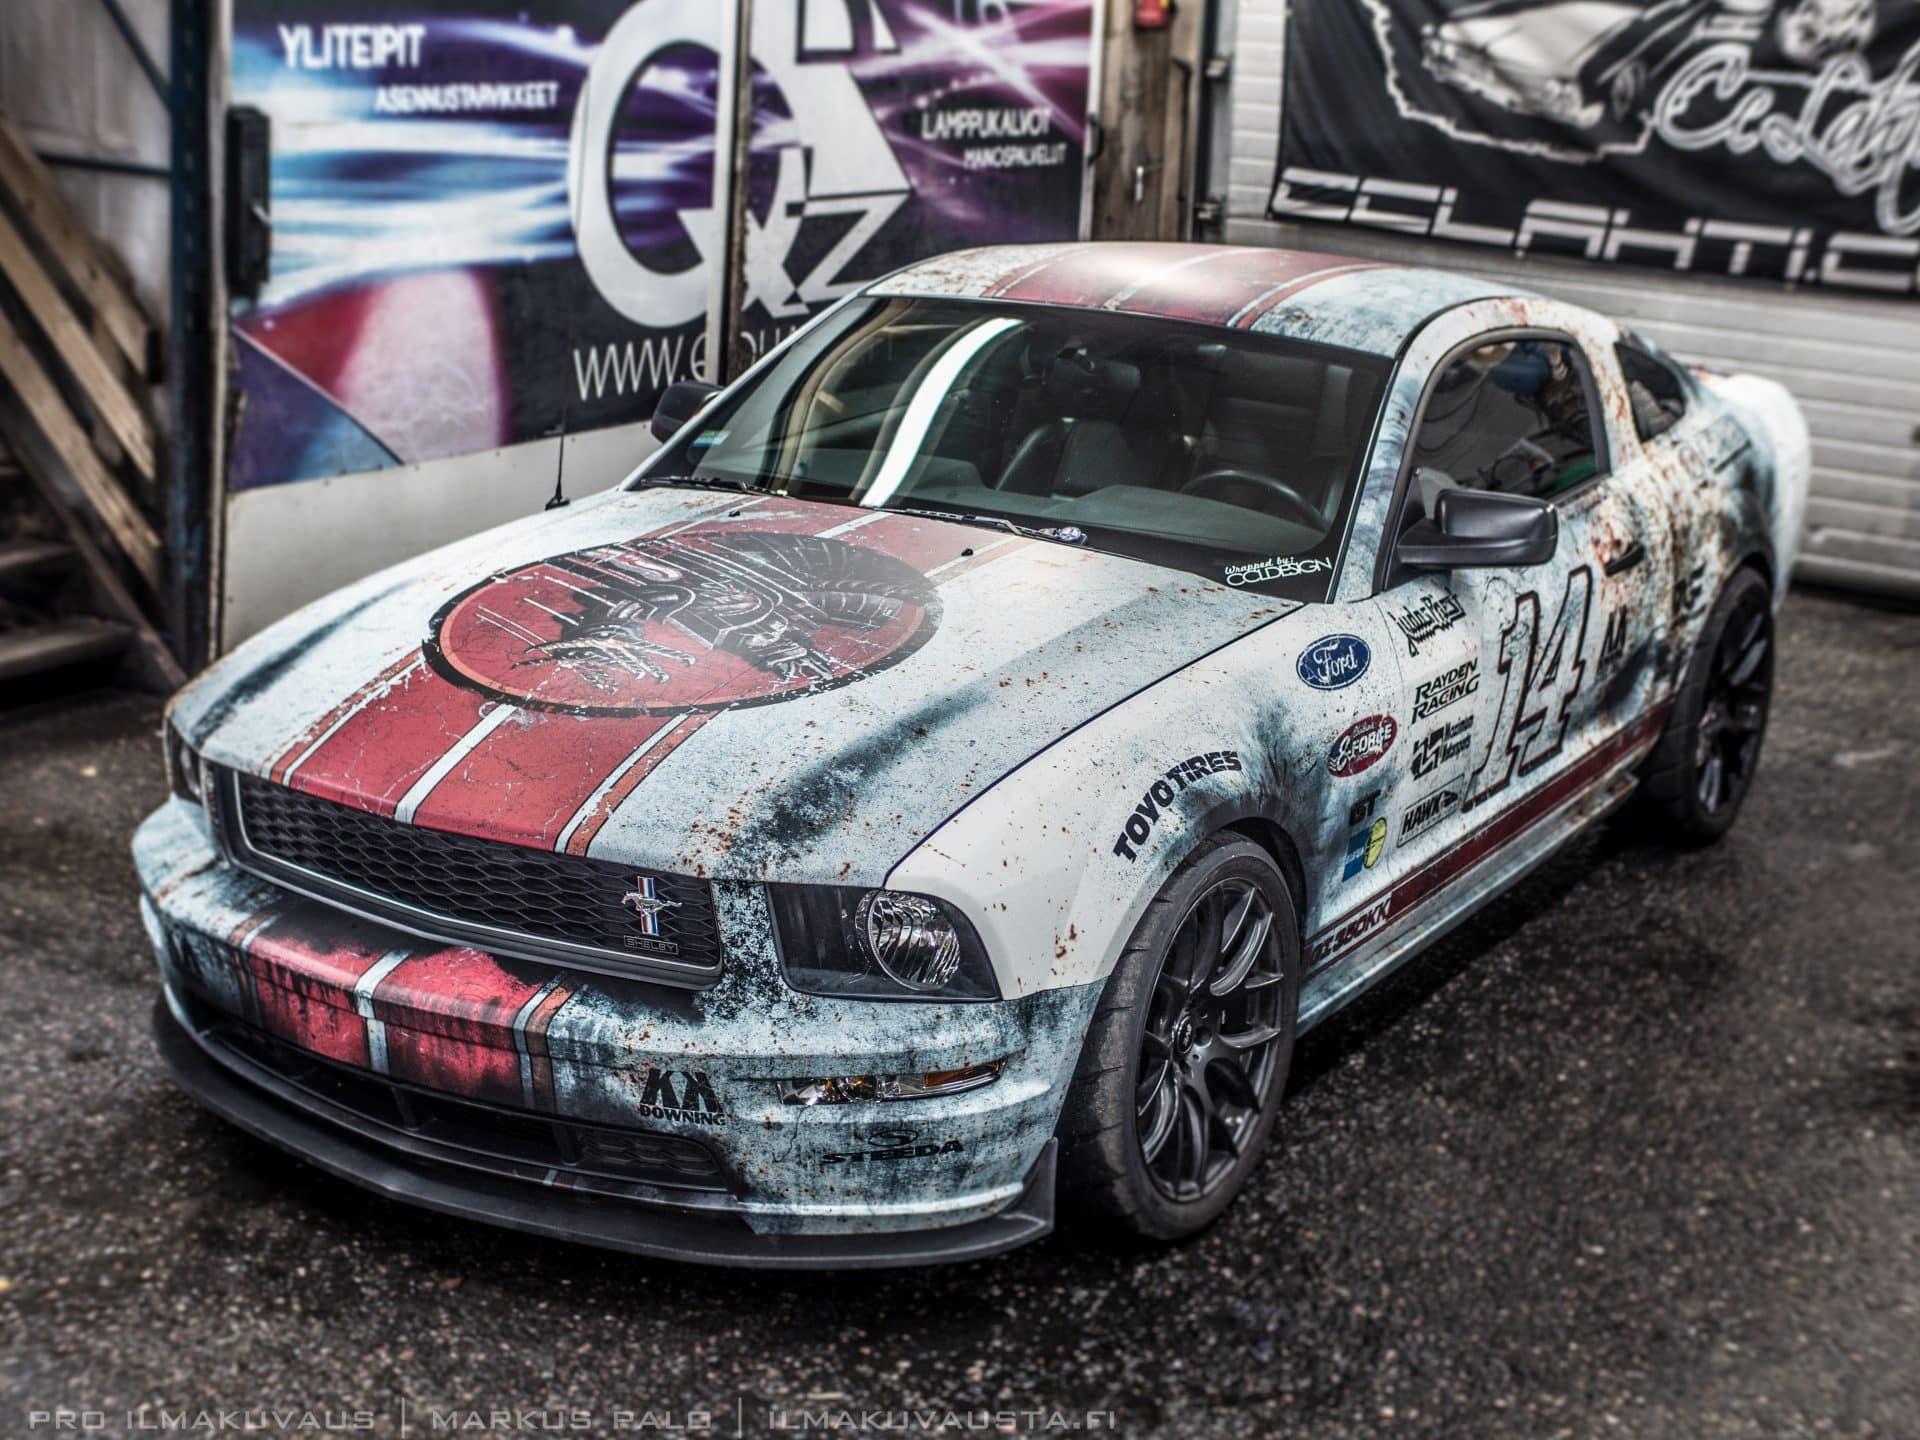 Retro Rust Wrap Design Ford Mustang GT | Skepple Inc